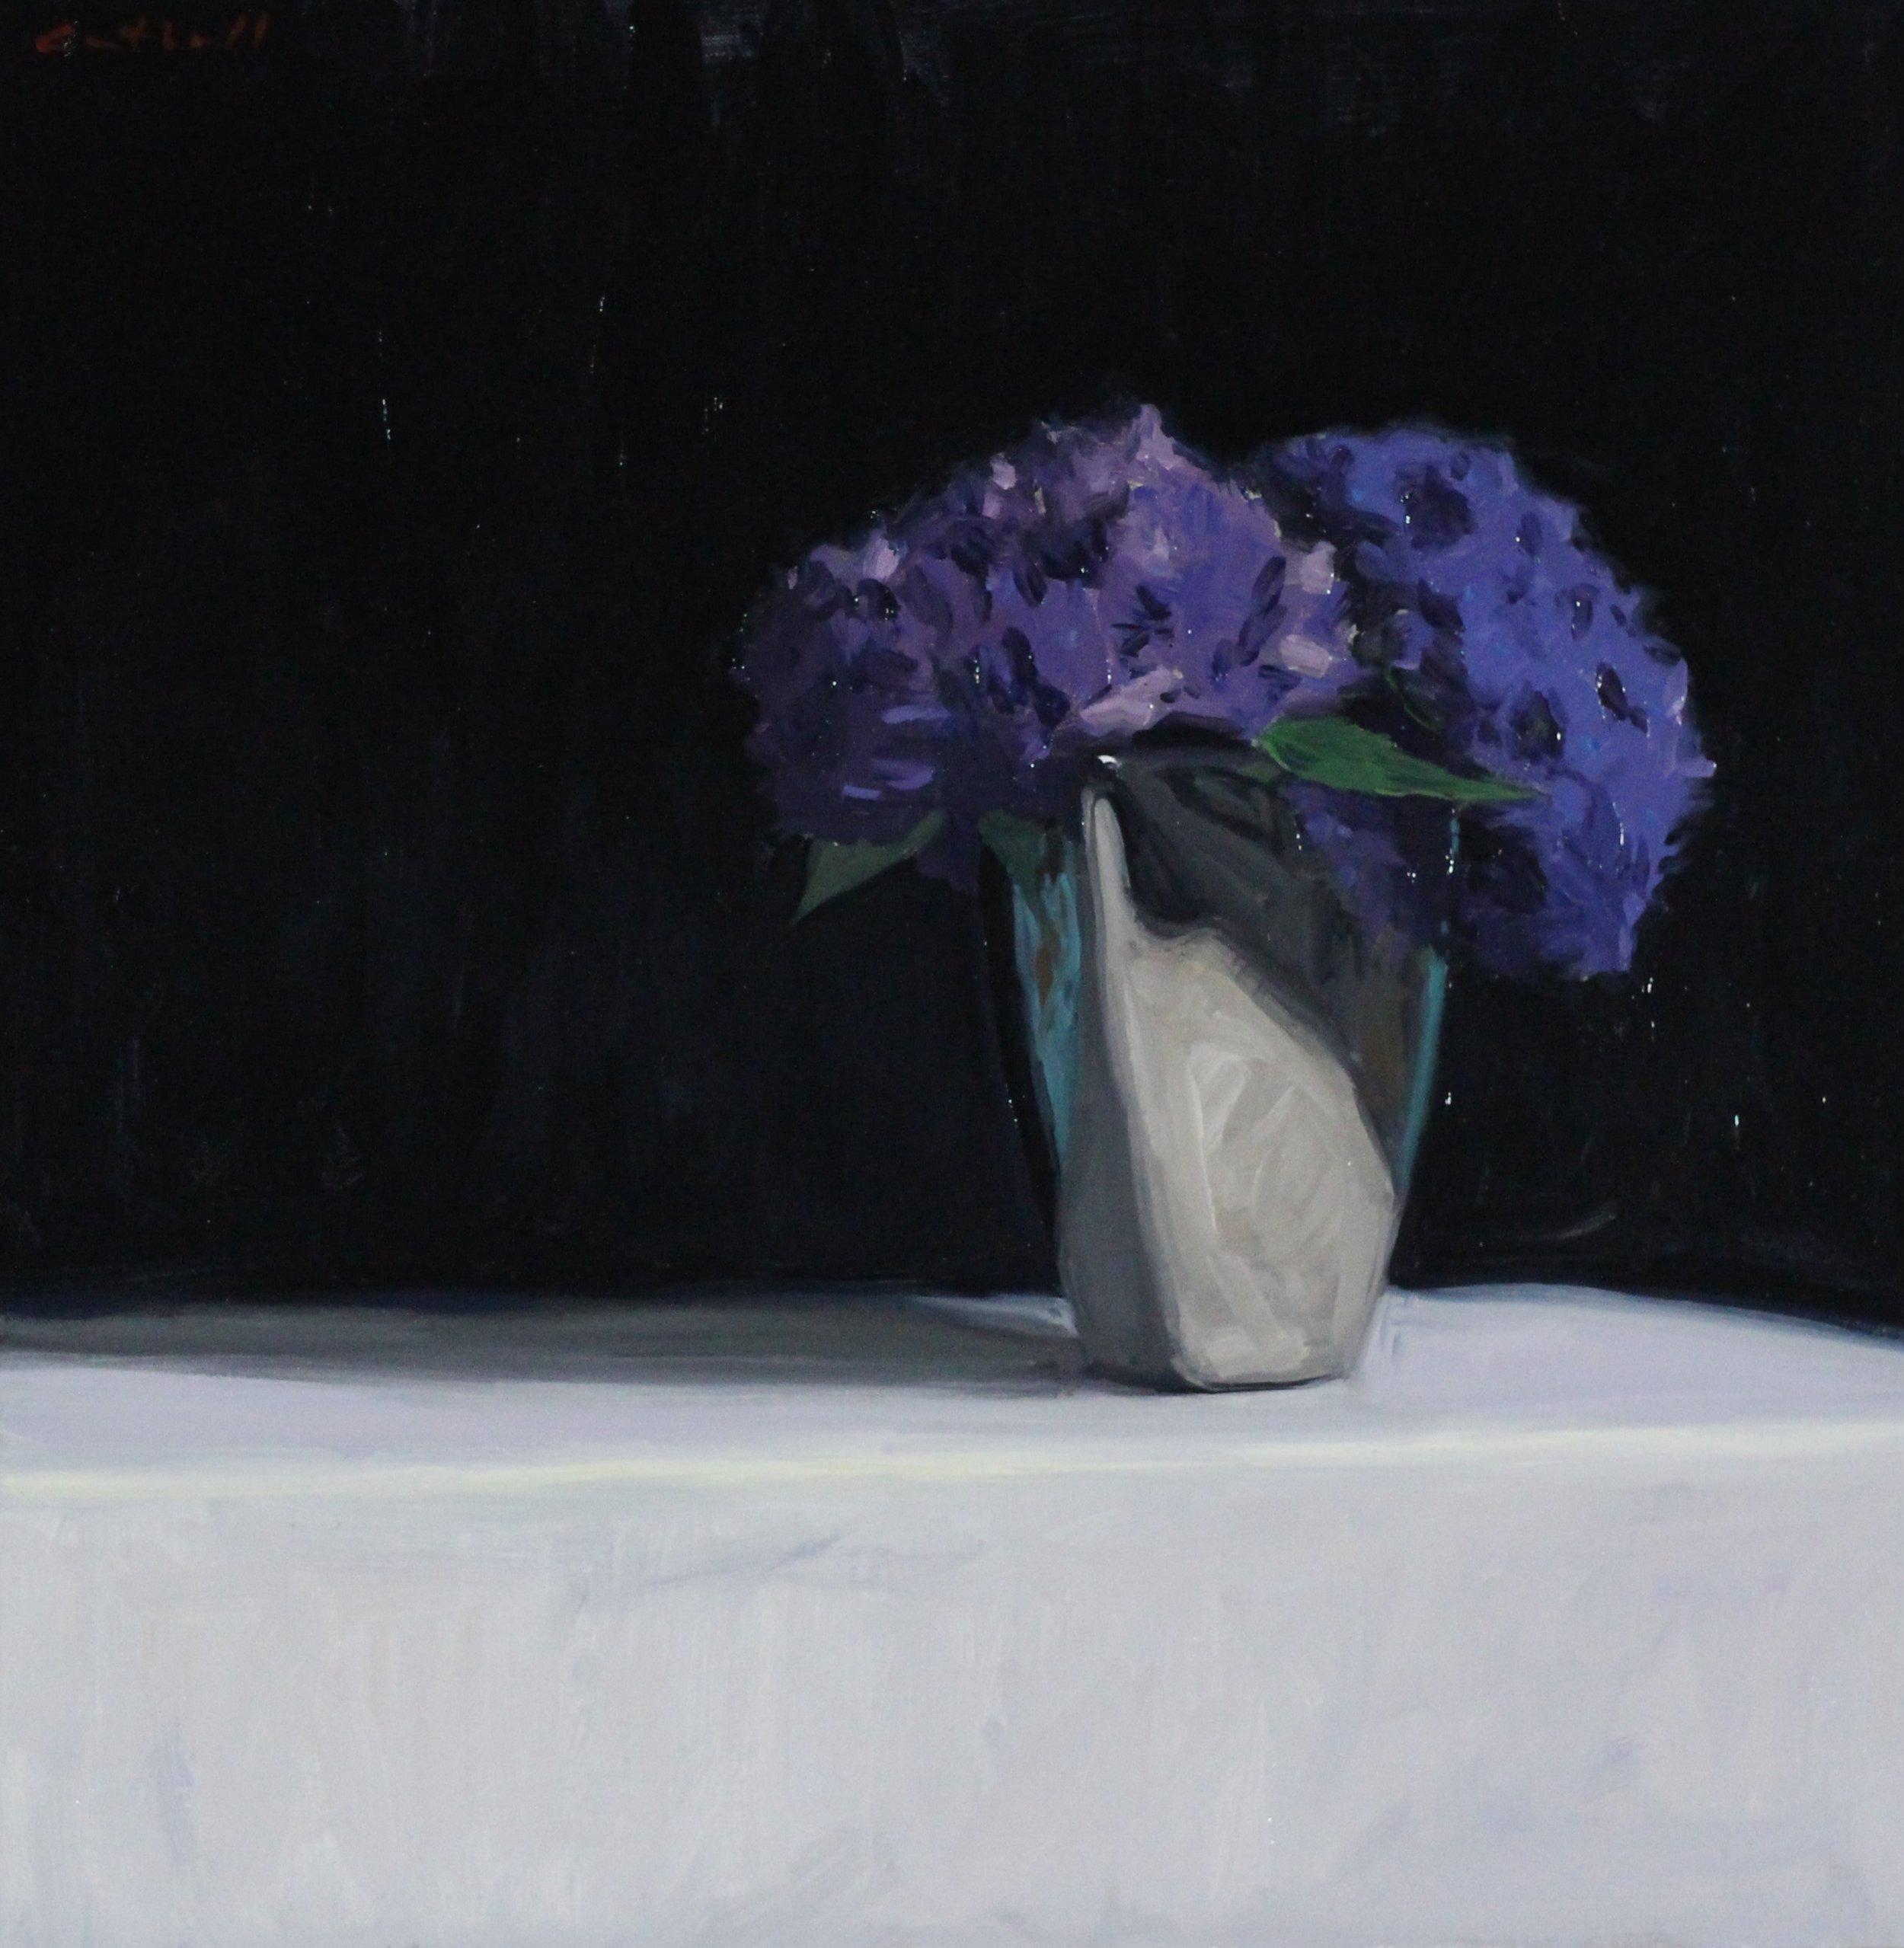 Hydrangea, Oil on Canvas, 45 x 45cm, 2017